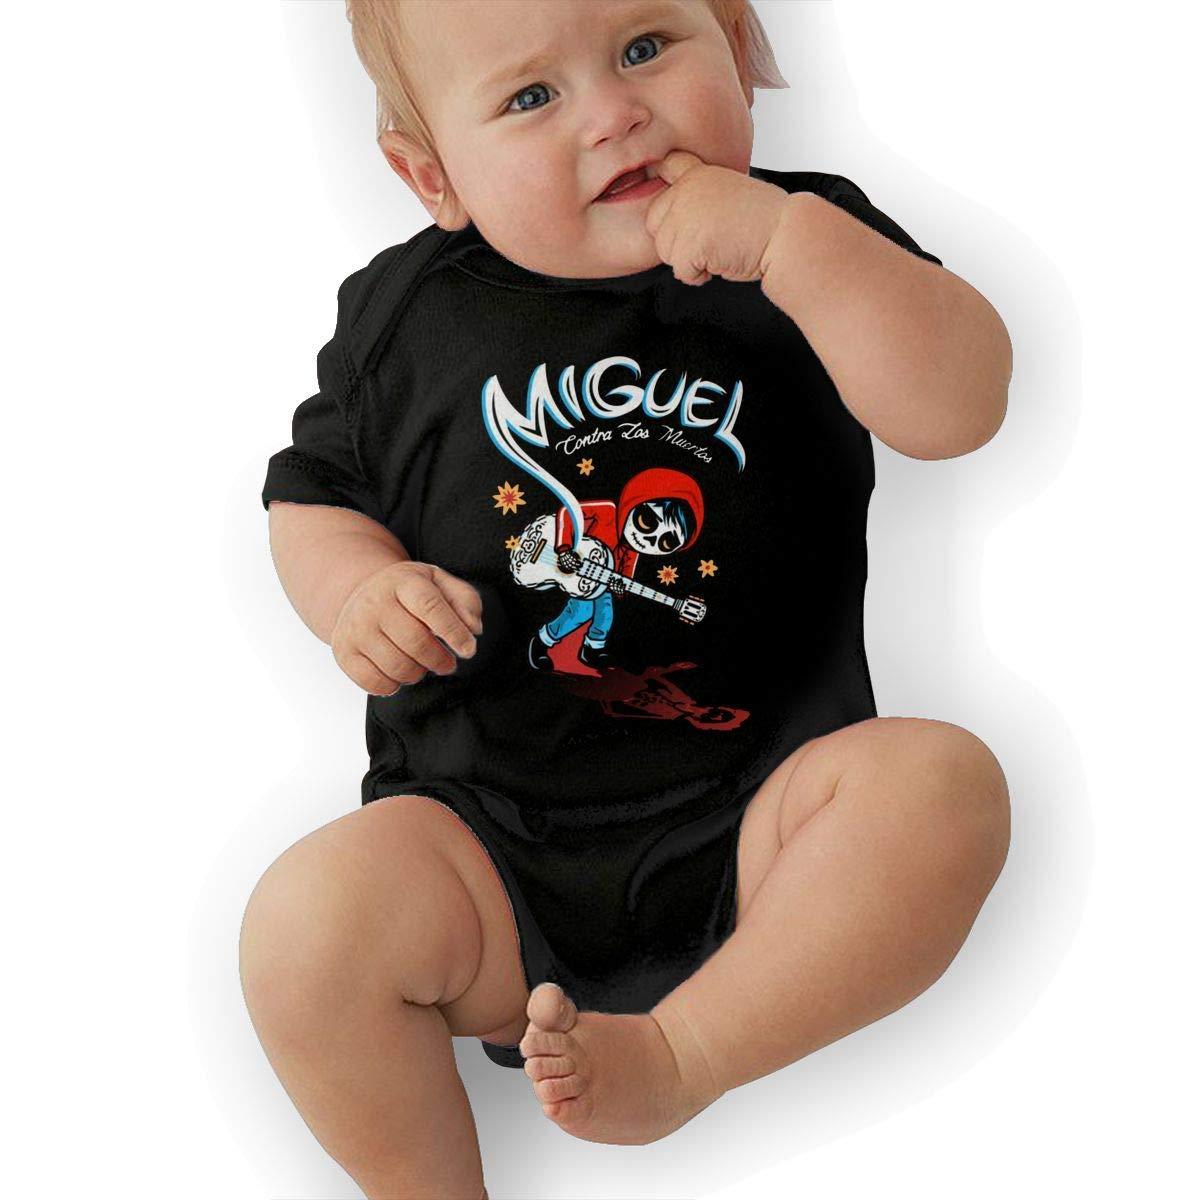 Coco Miguel VS The Dead Baby Short-Sleeve Baby Onesie Black,Black,2T